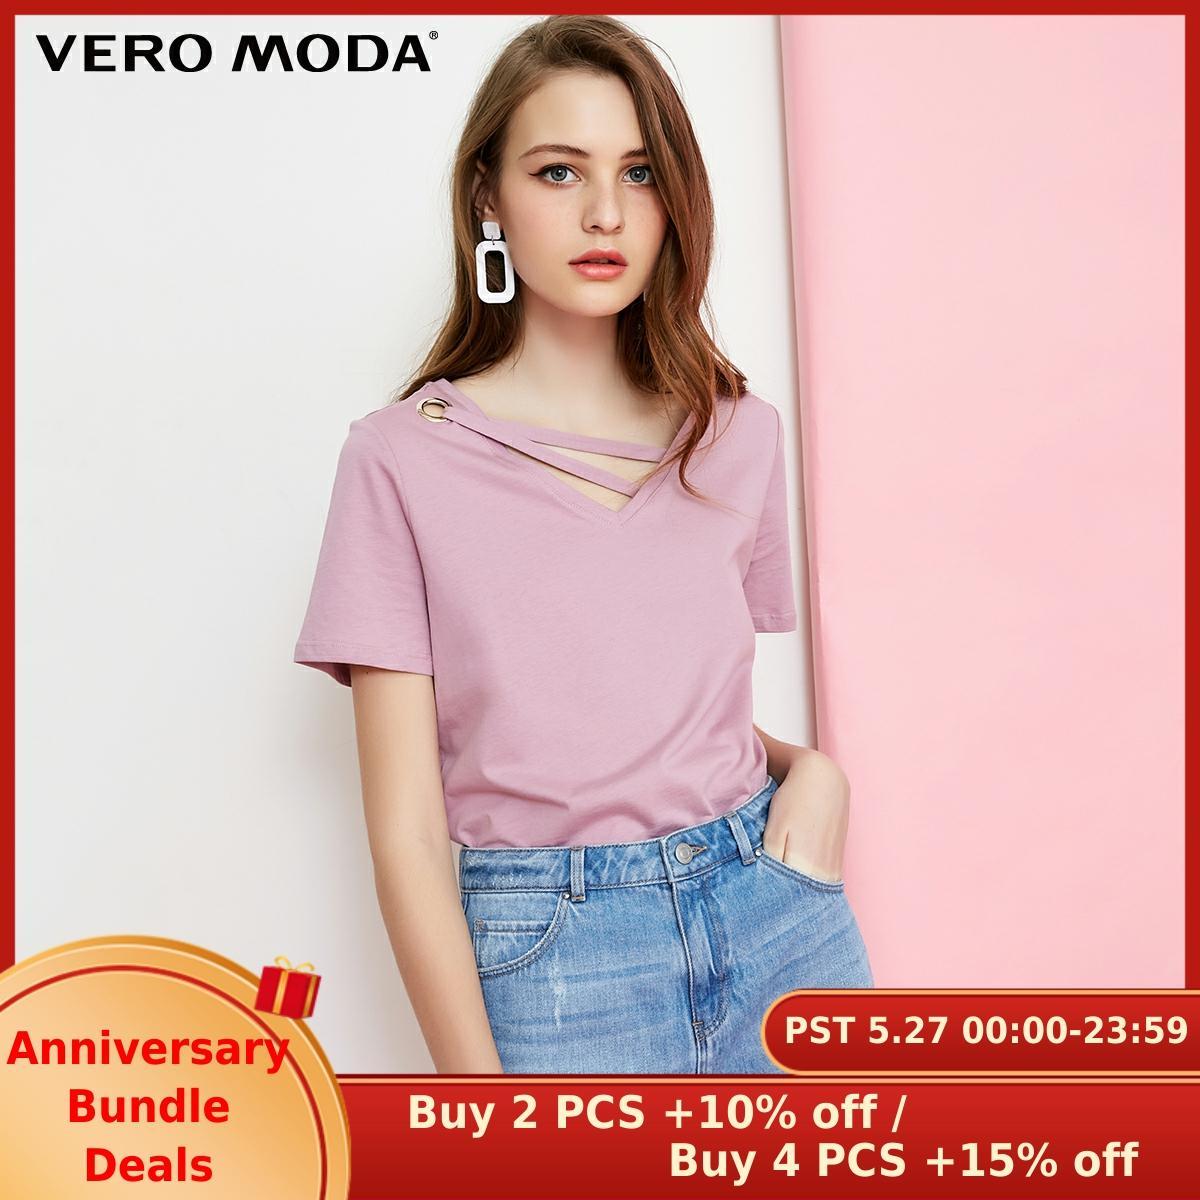 Vero Moda 100% Cotton Pure Color Collar Decorative Band Casual Short Sleeve T-shirt   318101523